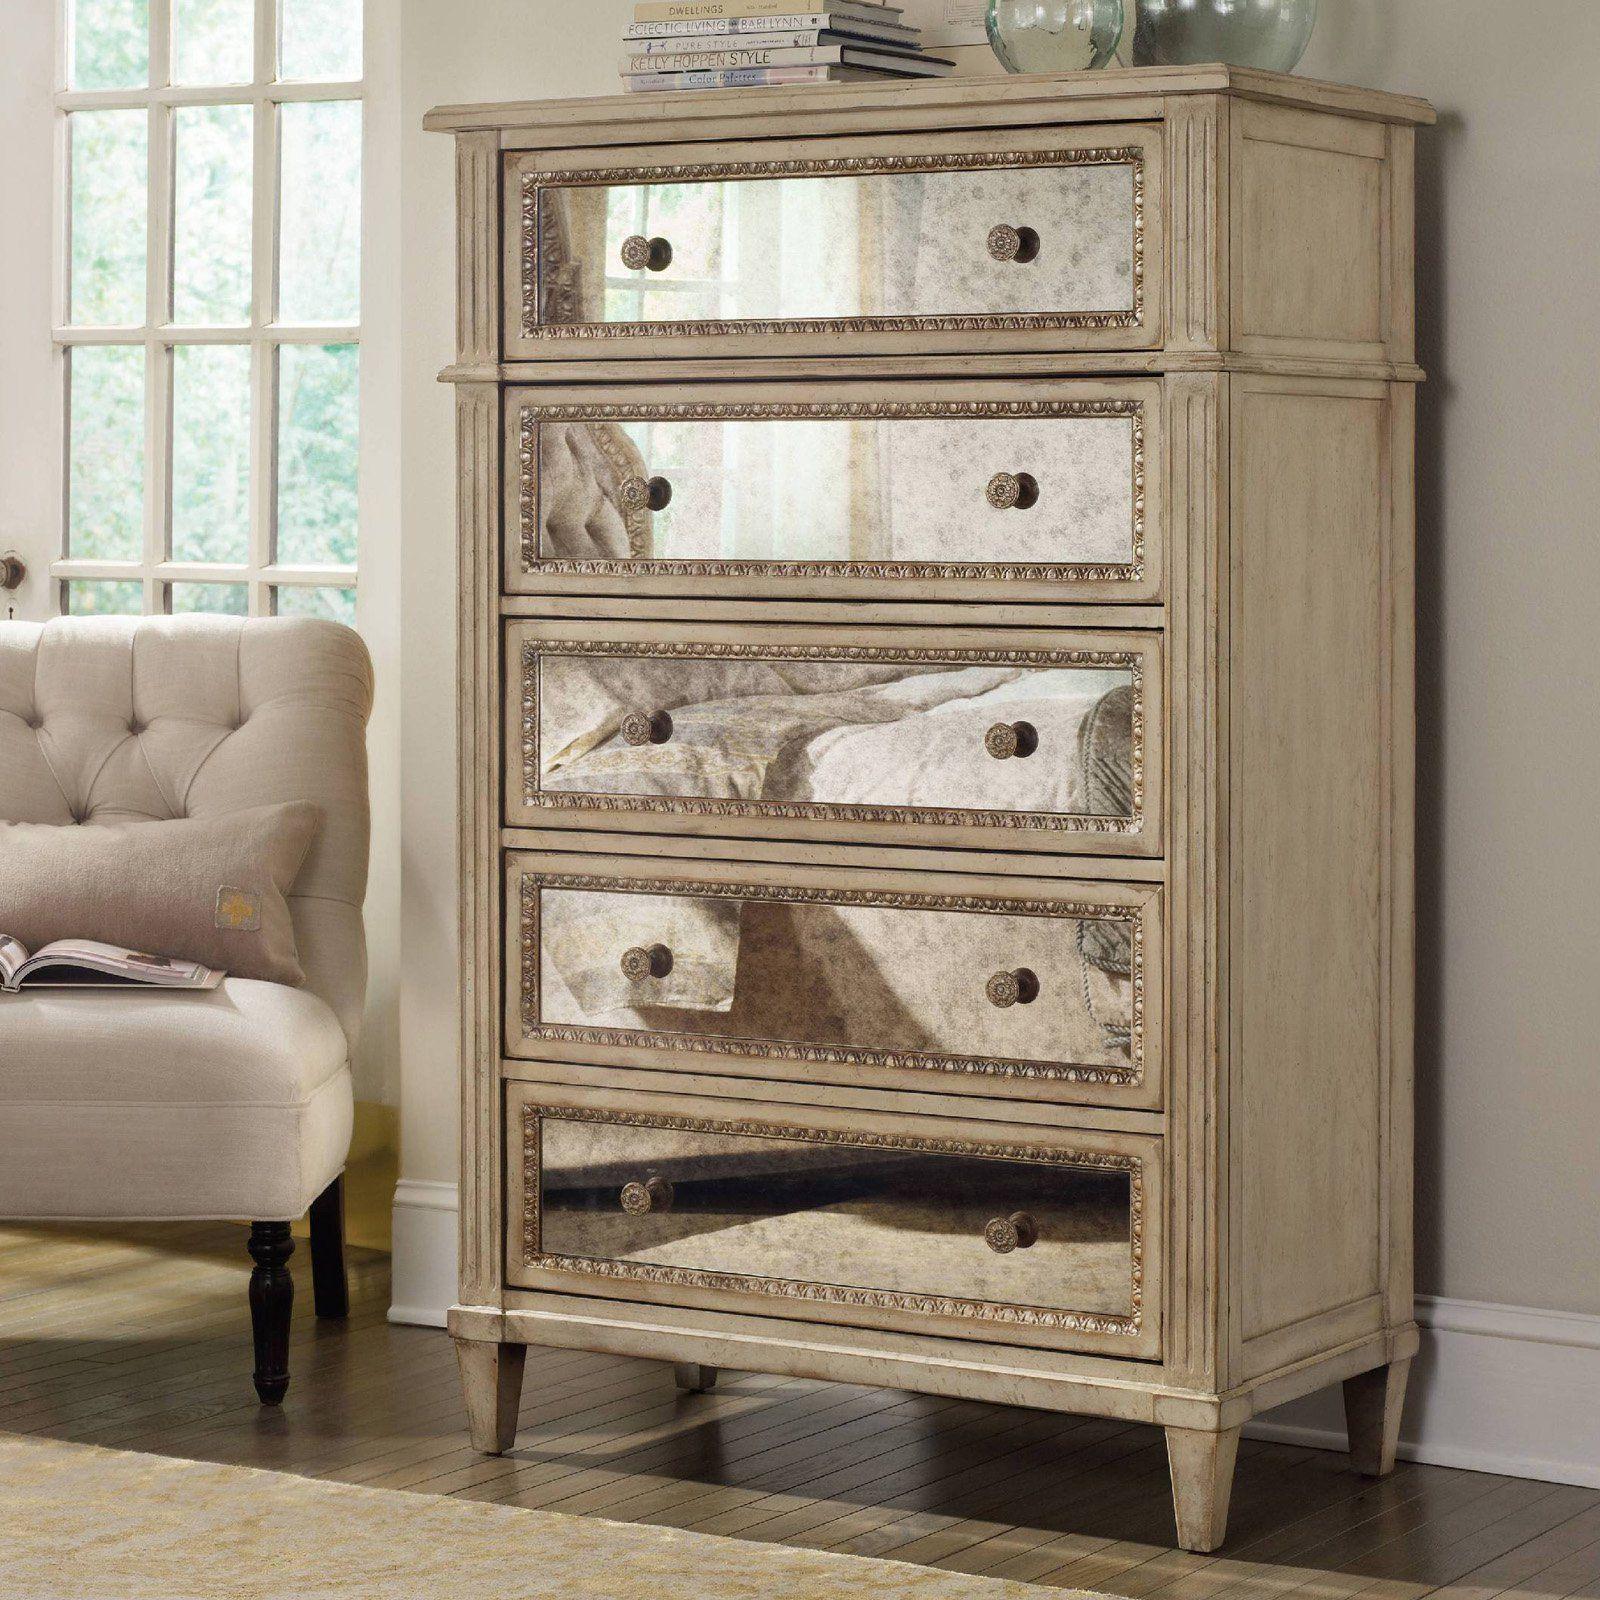 panel zzz furniture locator hooker corsica bedroom king item ahfa group dealer collections